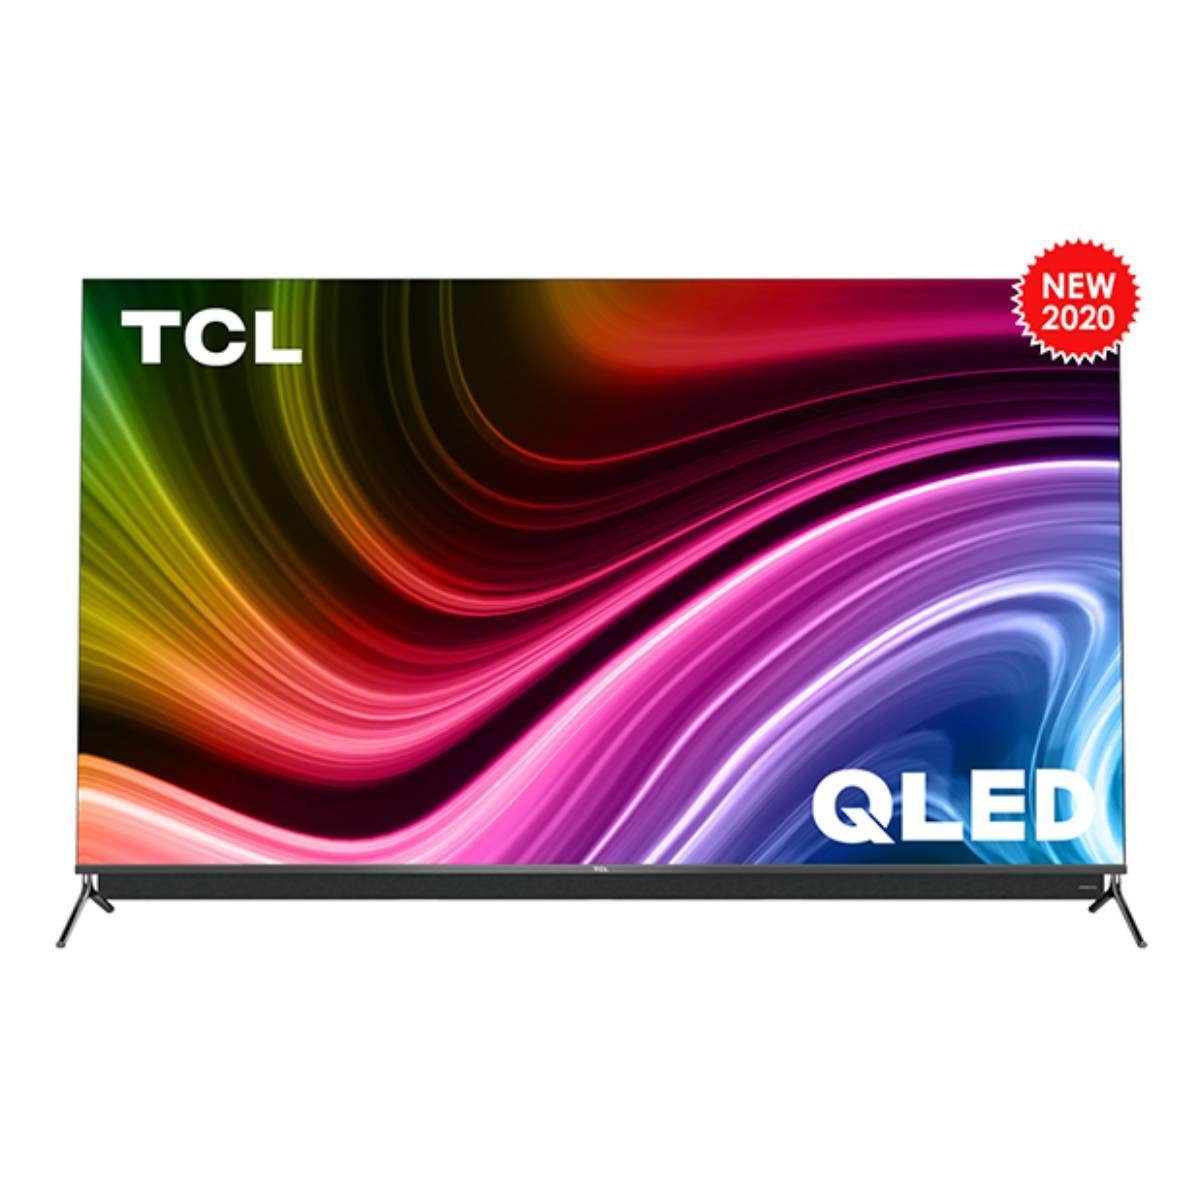 टीसीएल 55 इंच 4K QLED एंड्रॉयड टीवी (C815)